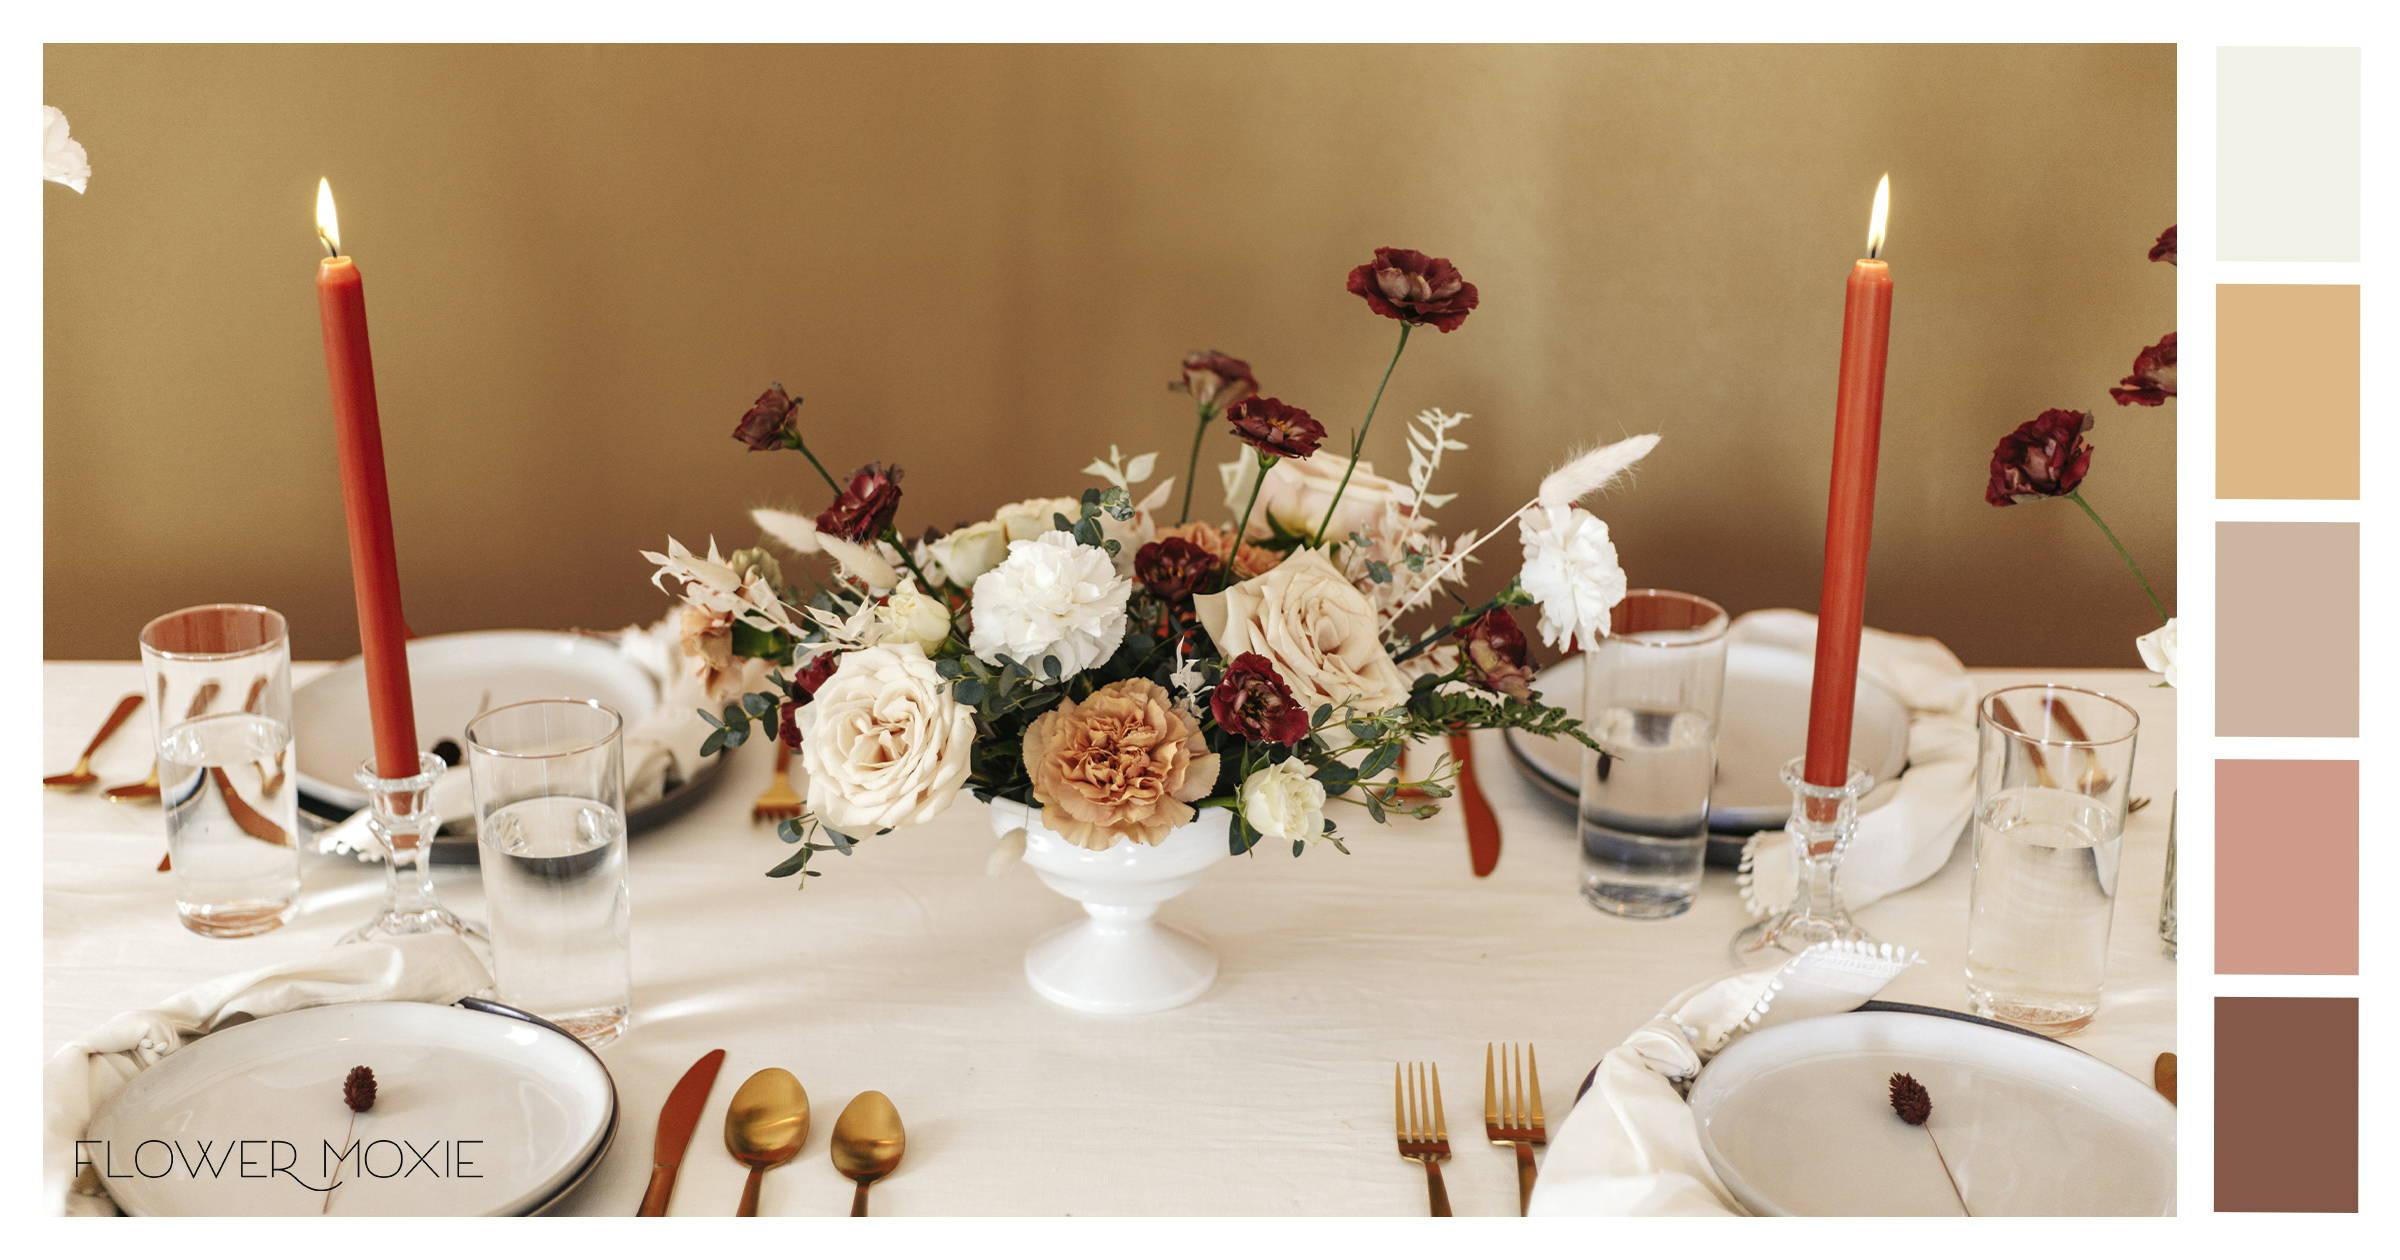 canyon rose diy fresh floral kits online